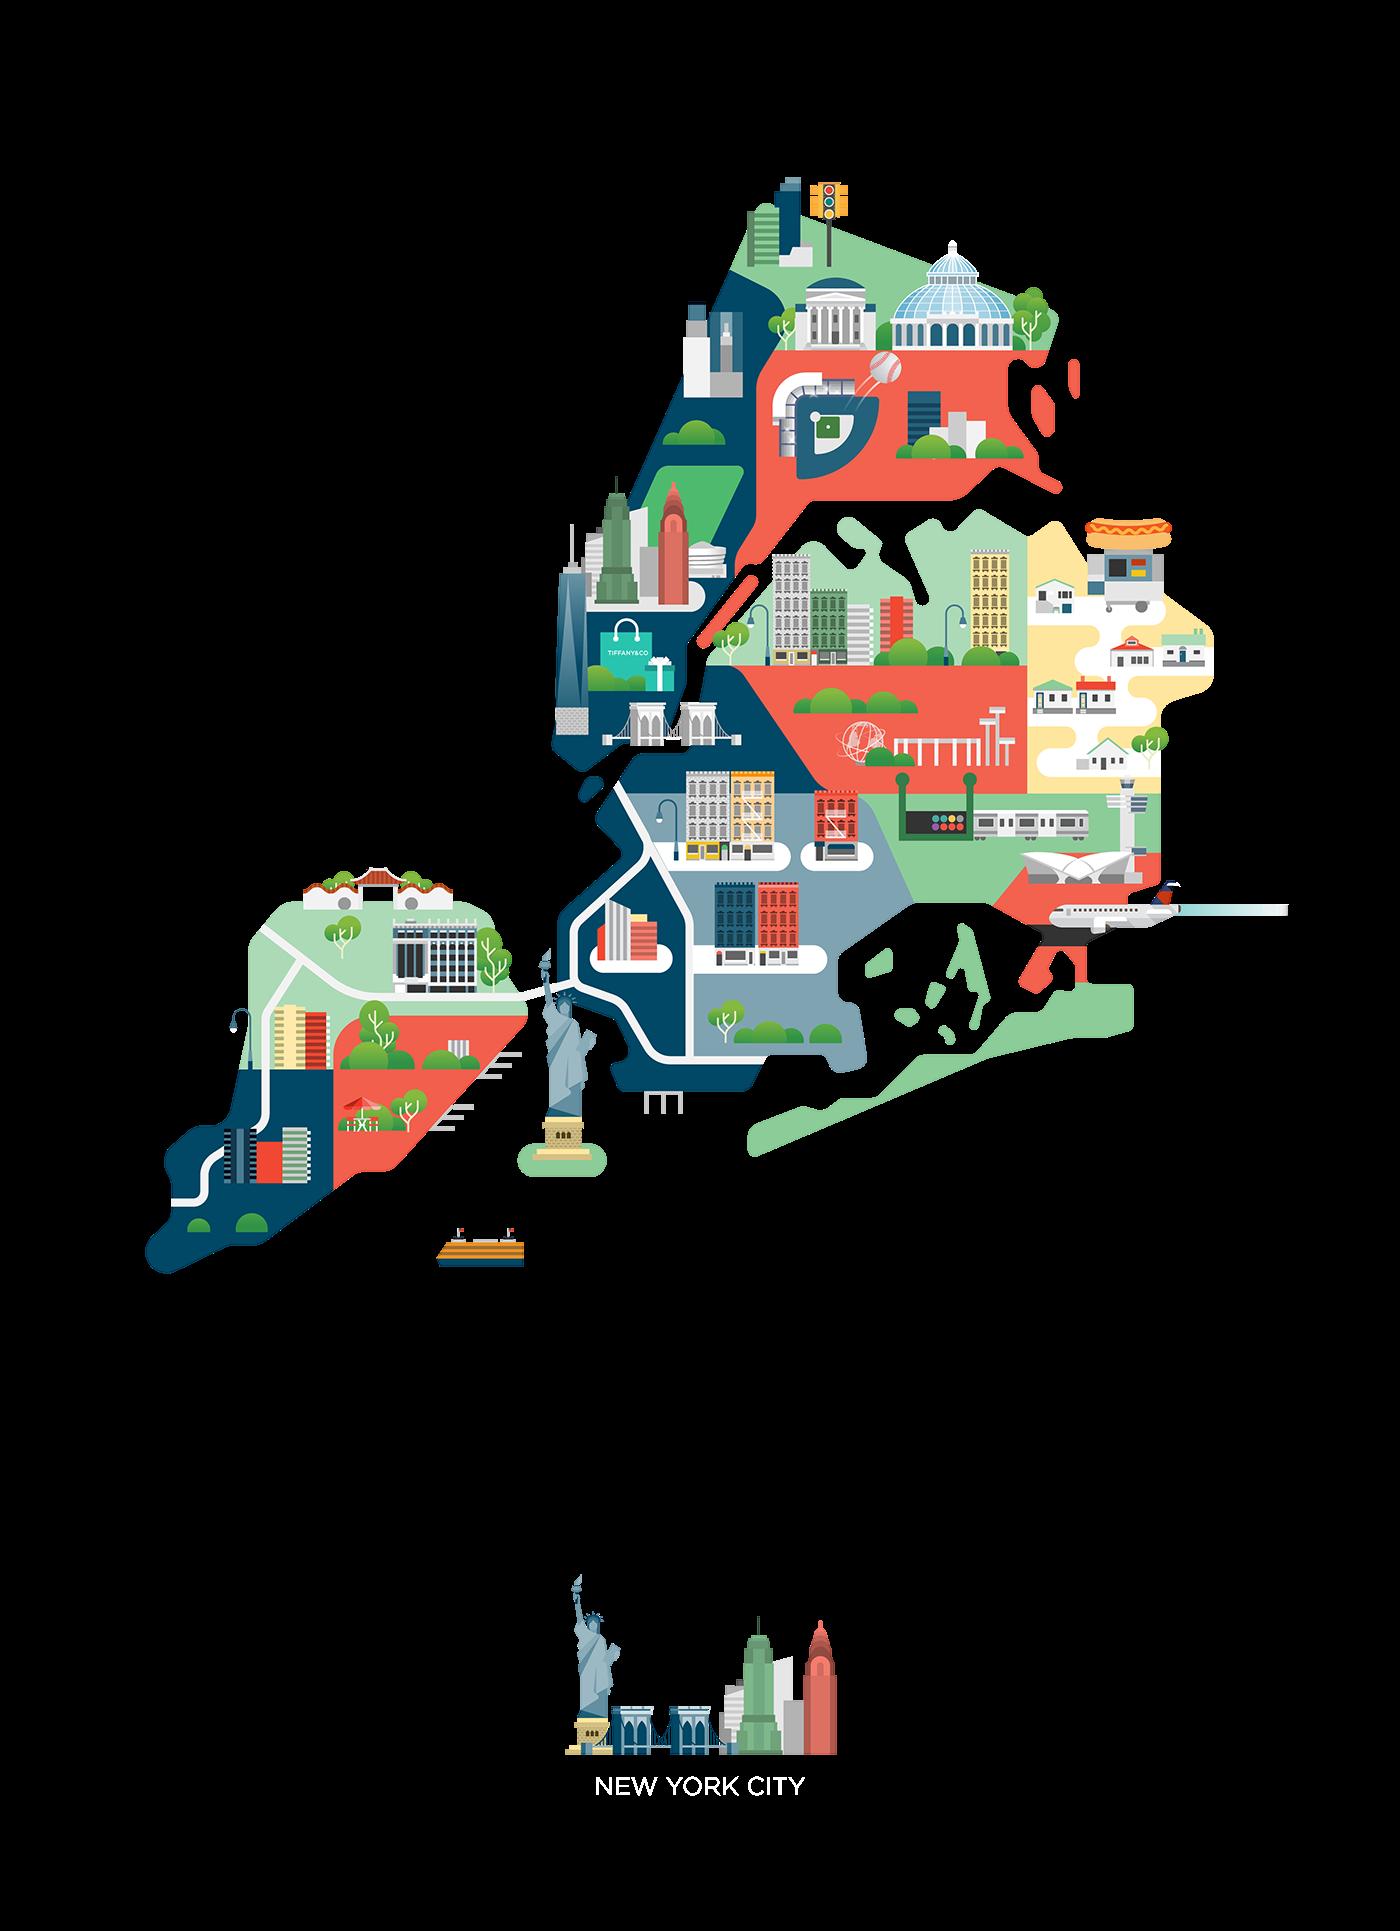 america map city nyc la California Vegas neworleans usa